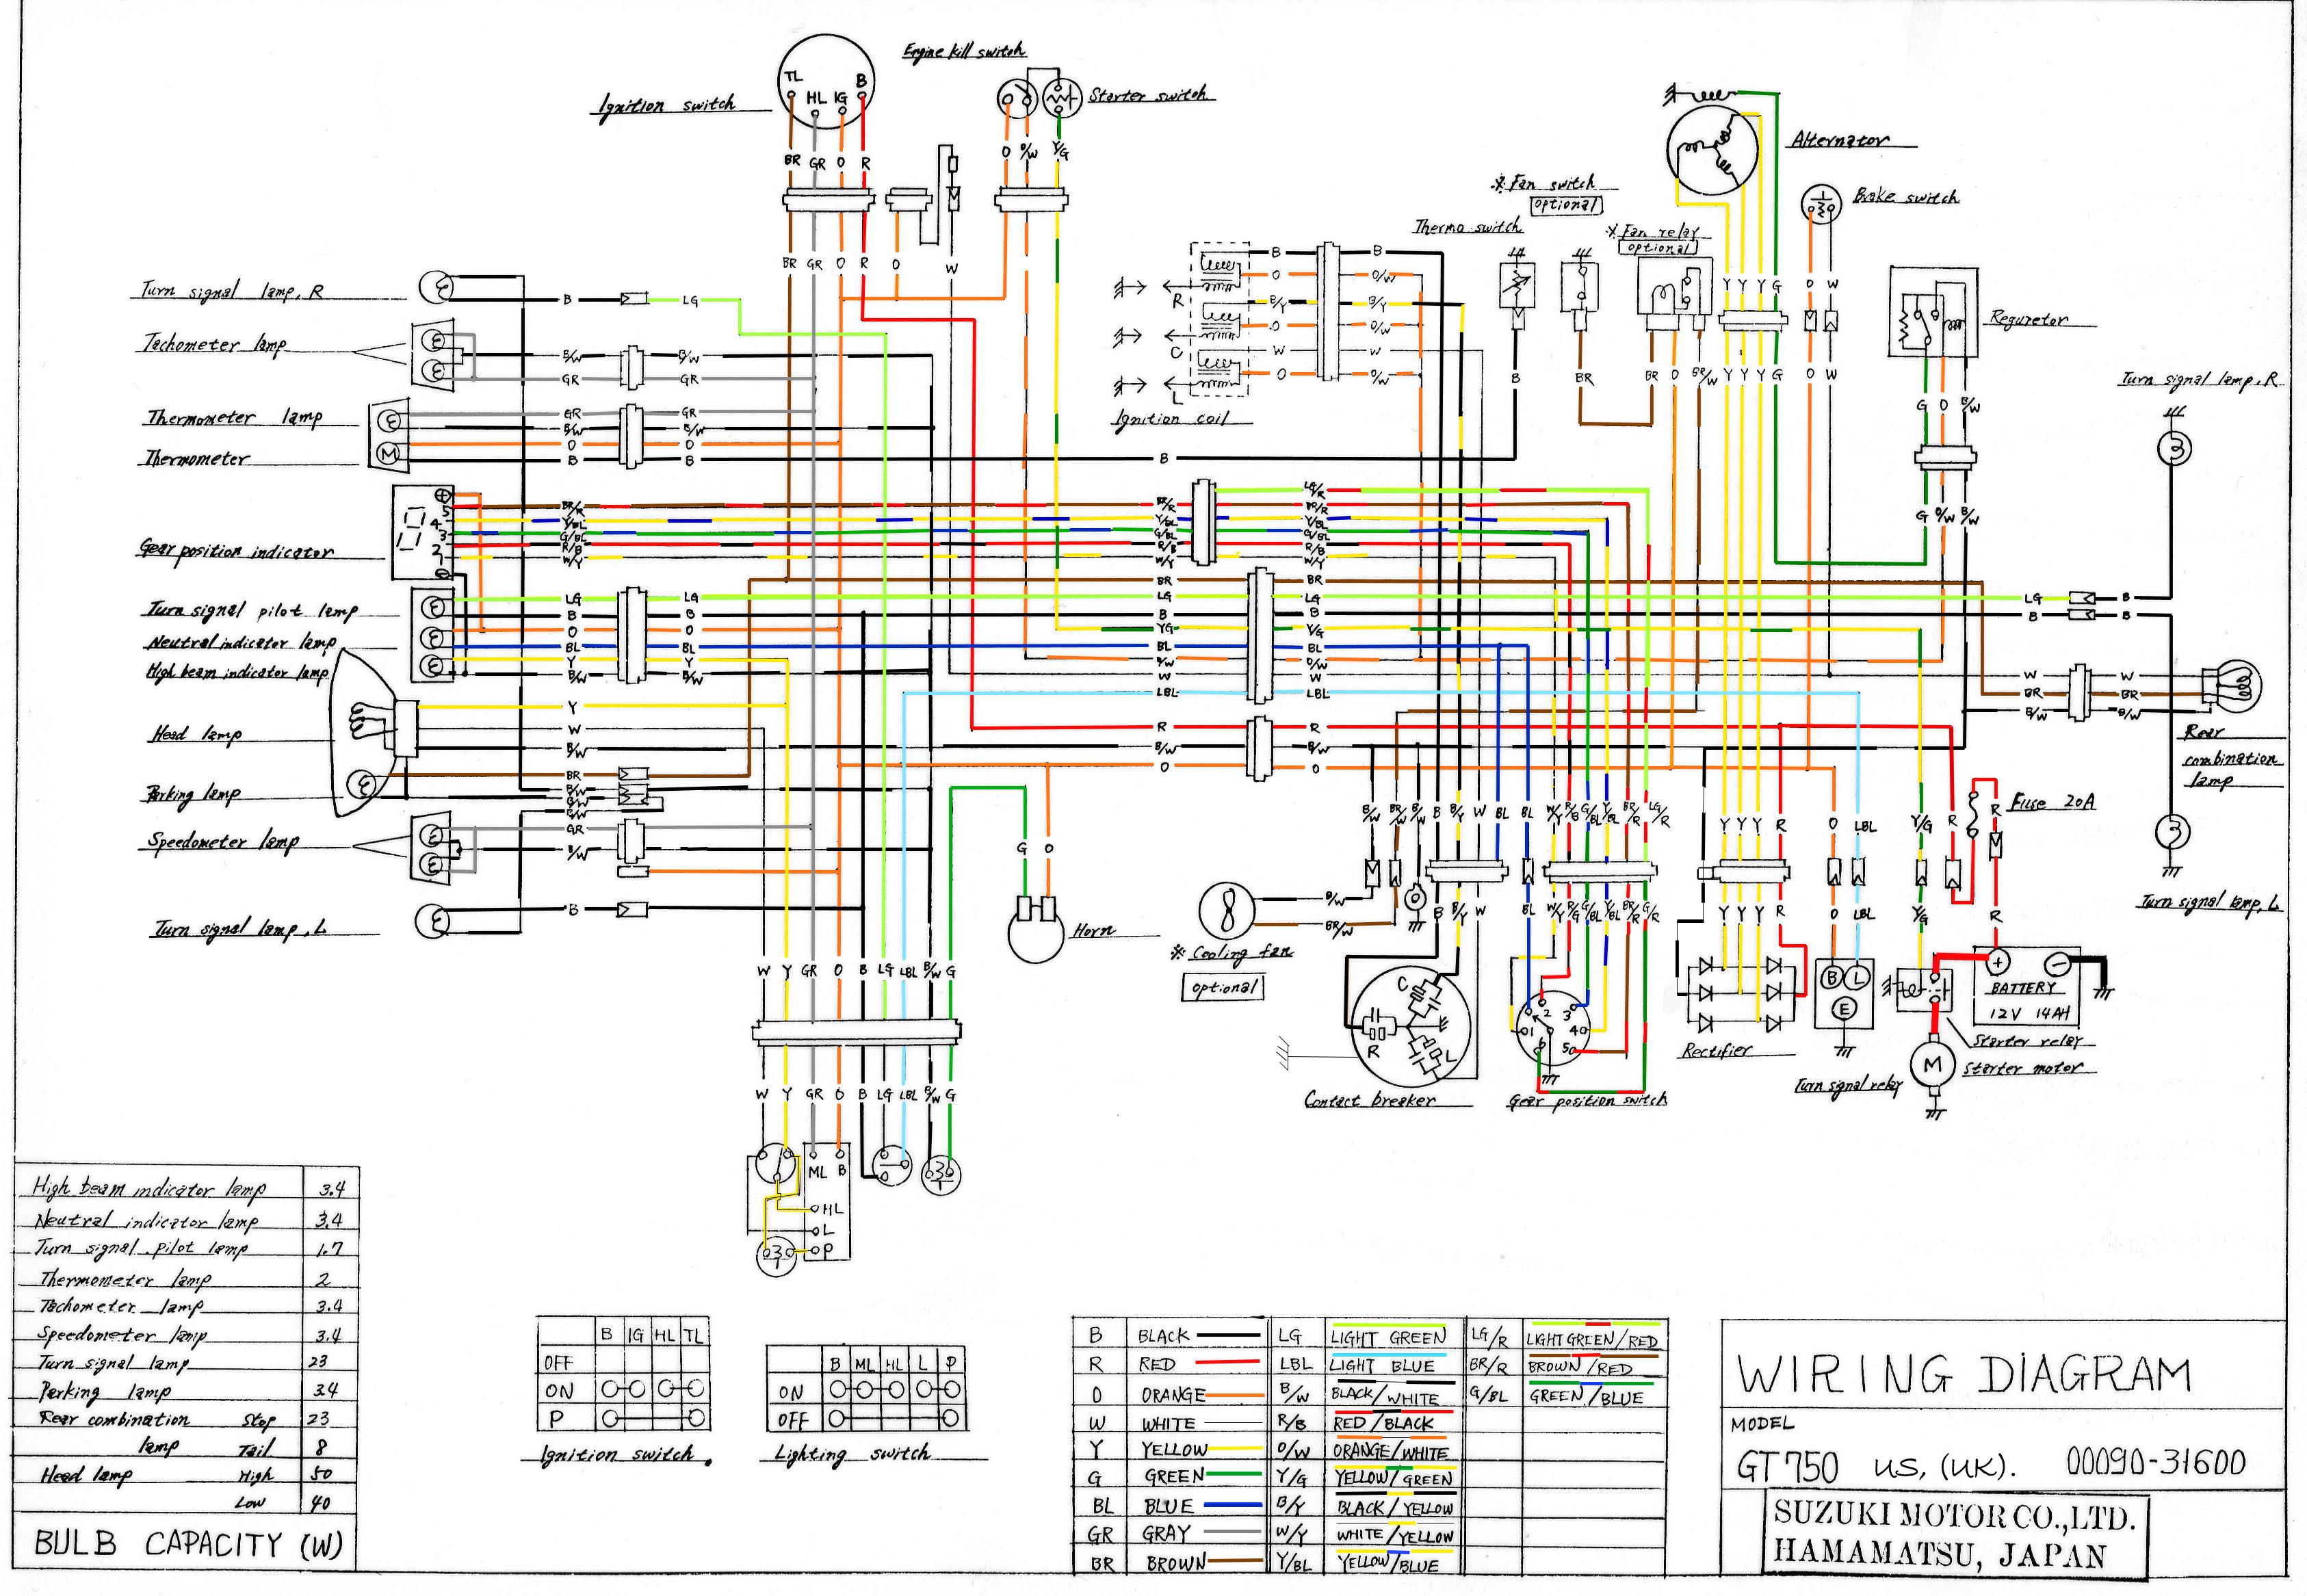 1999 sv650 wiring diagram triumph tr3 hayabusa schematic symbols